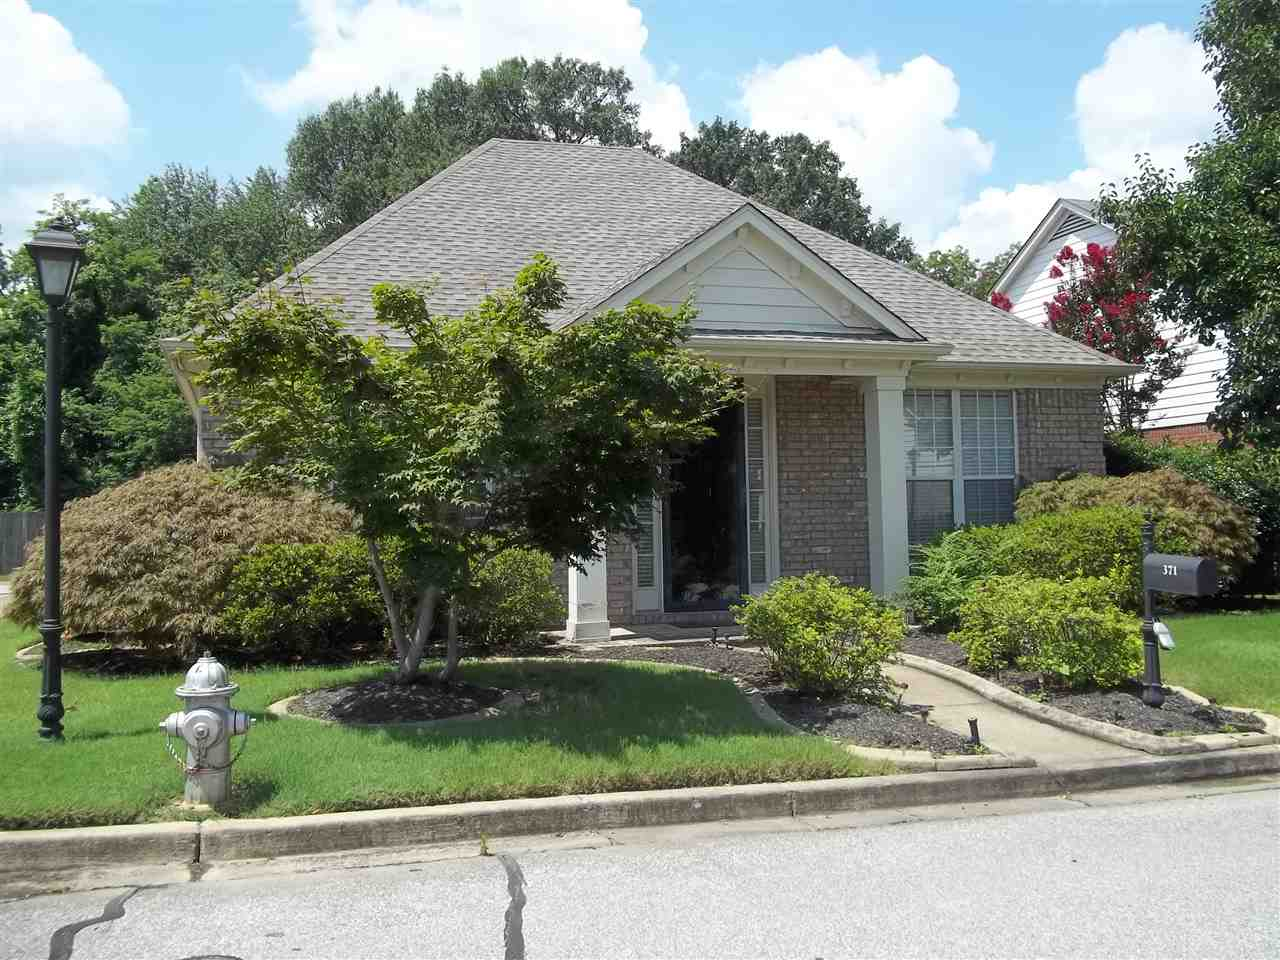 371 FOUNTAIN CREST DR, Memphis, TN 38120